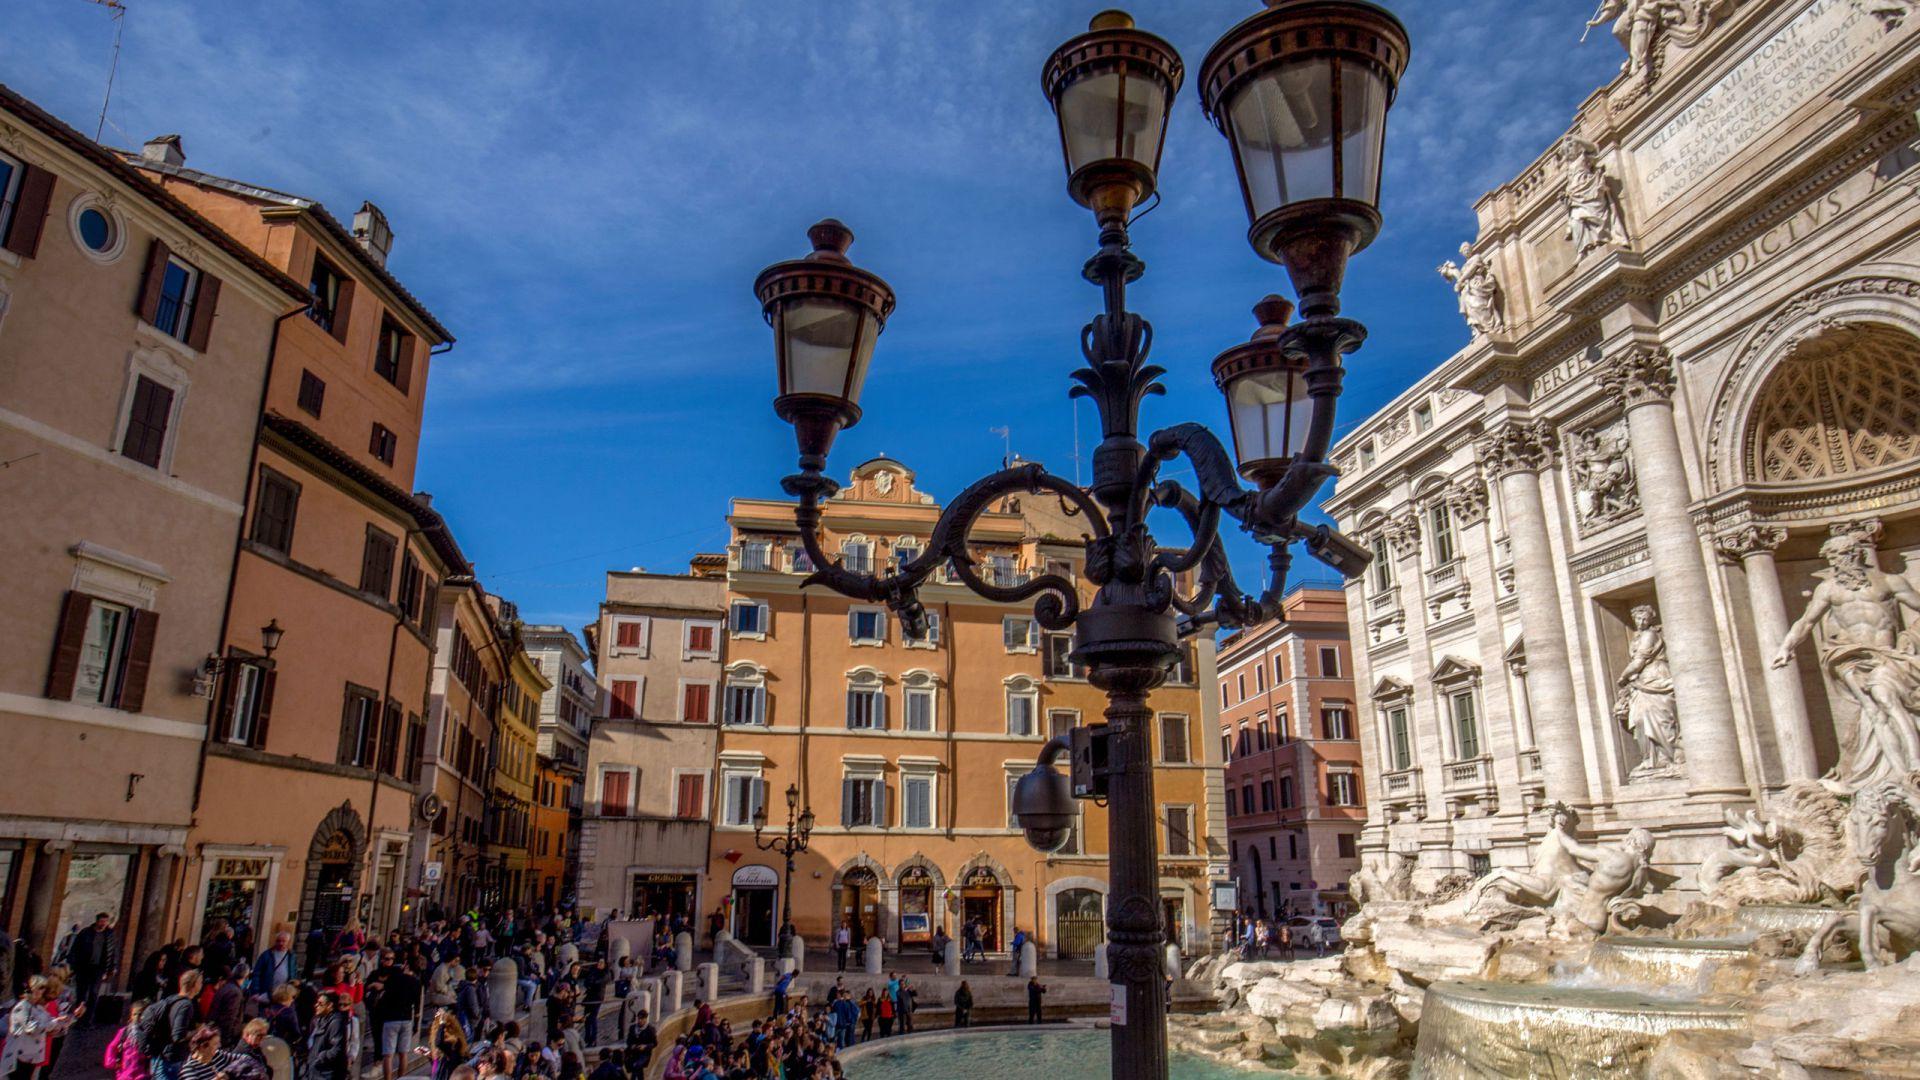 albergo-ottocento-rome-monuments-03